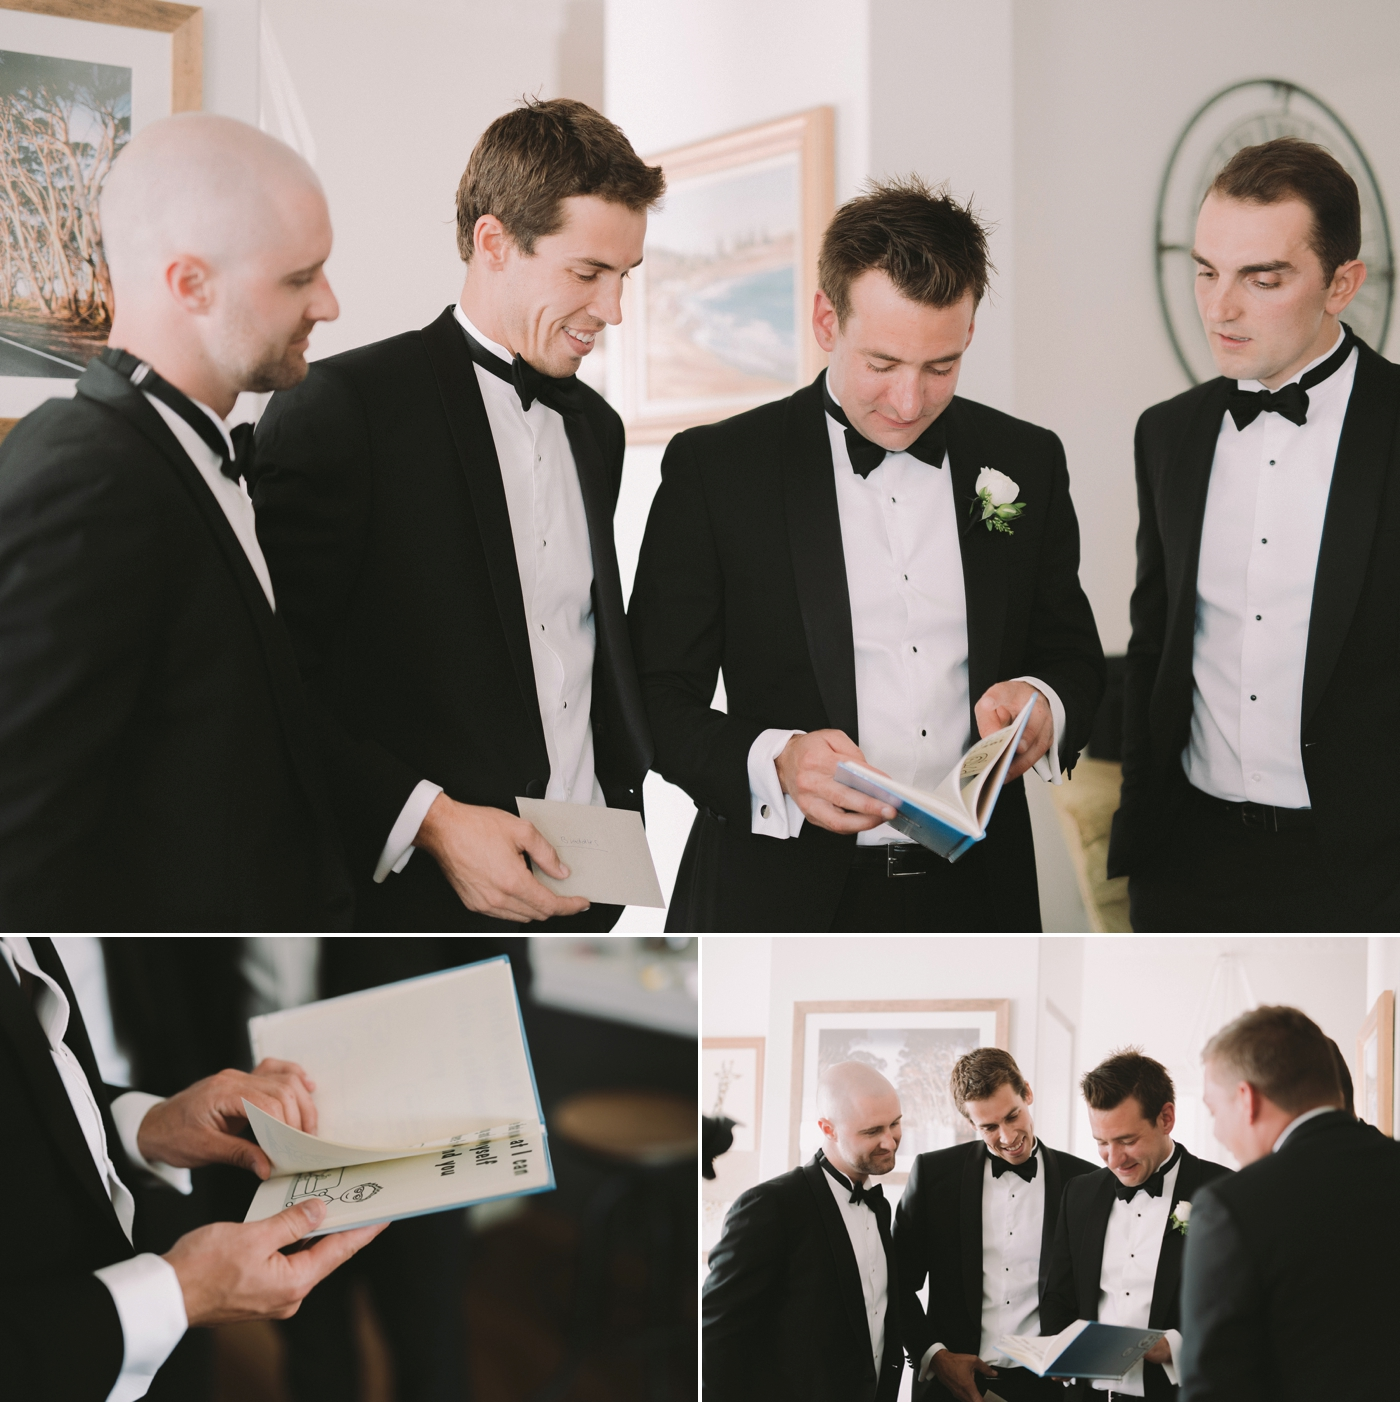 Bec & Brad - Waverley Estate Wedding - Natural Wedding Photographer in Adelaide - www.katherineschultzphotography.com 26